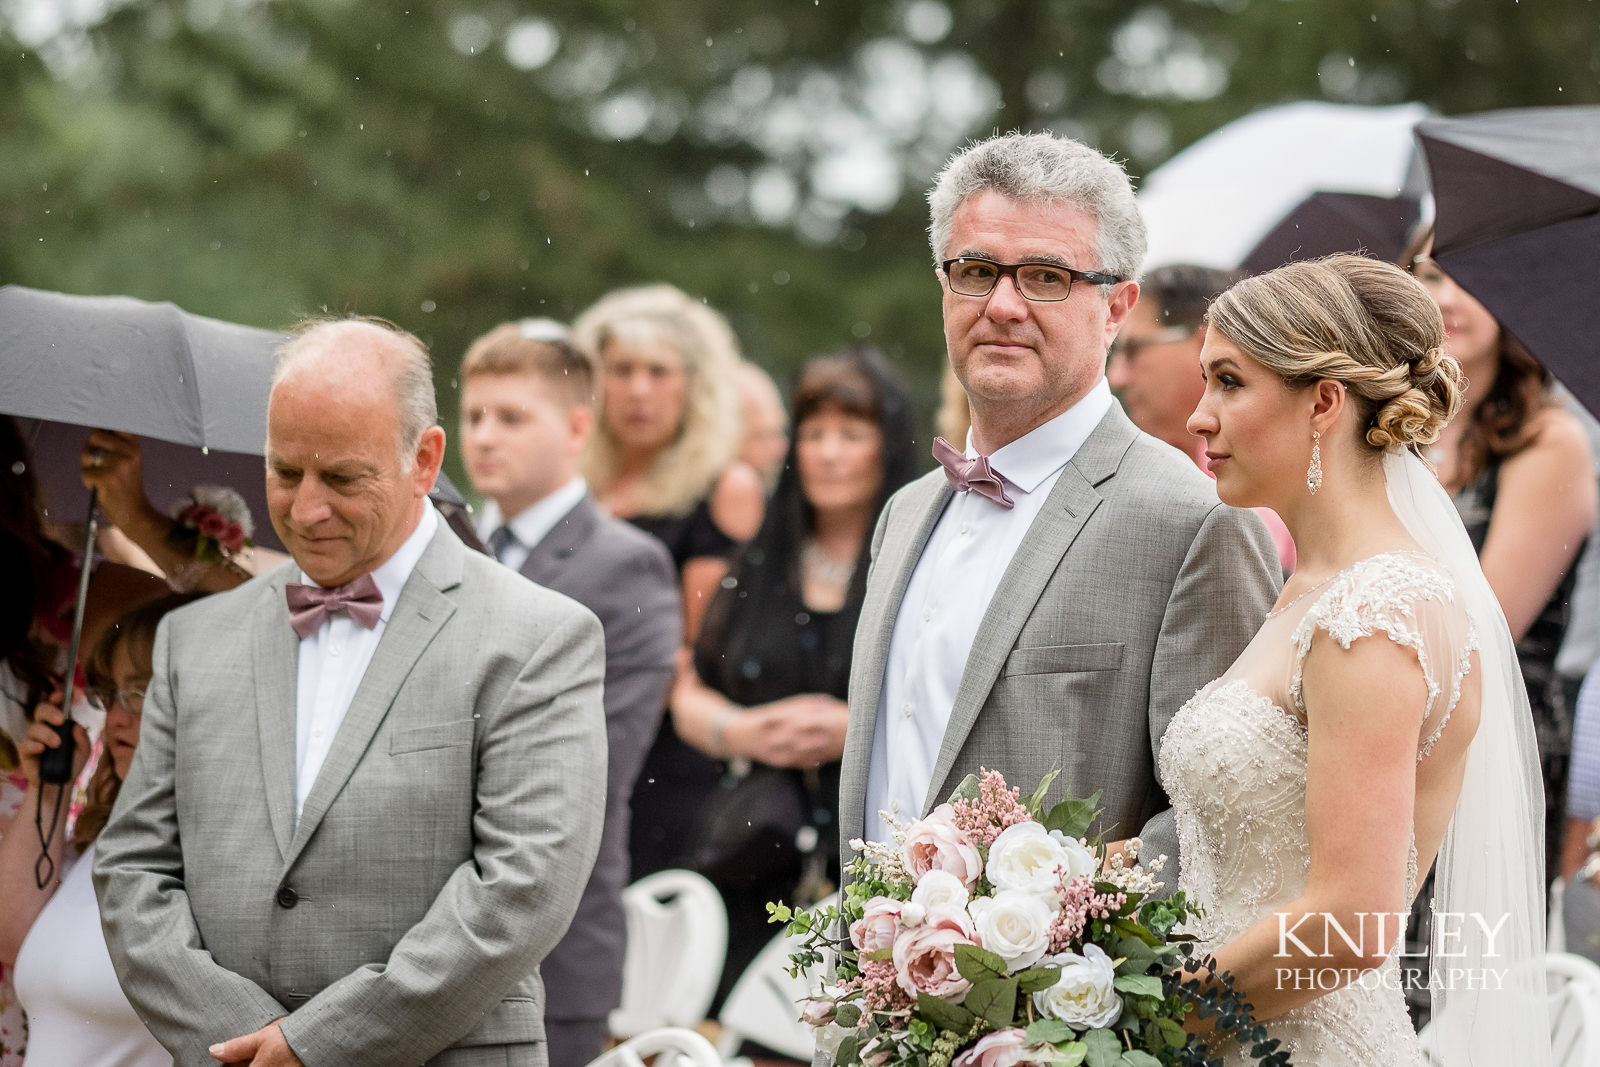 045 - Ontario Golf Club Wedding Pictures - XT2A6624.jpg